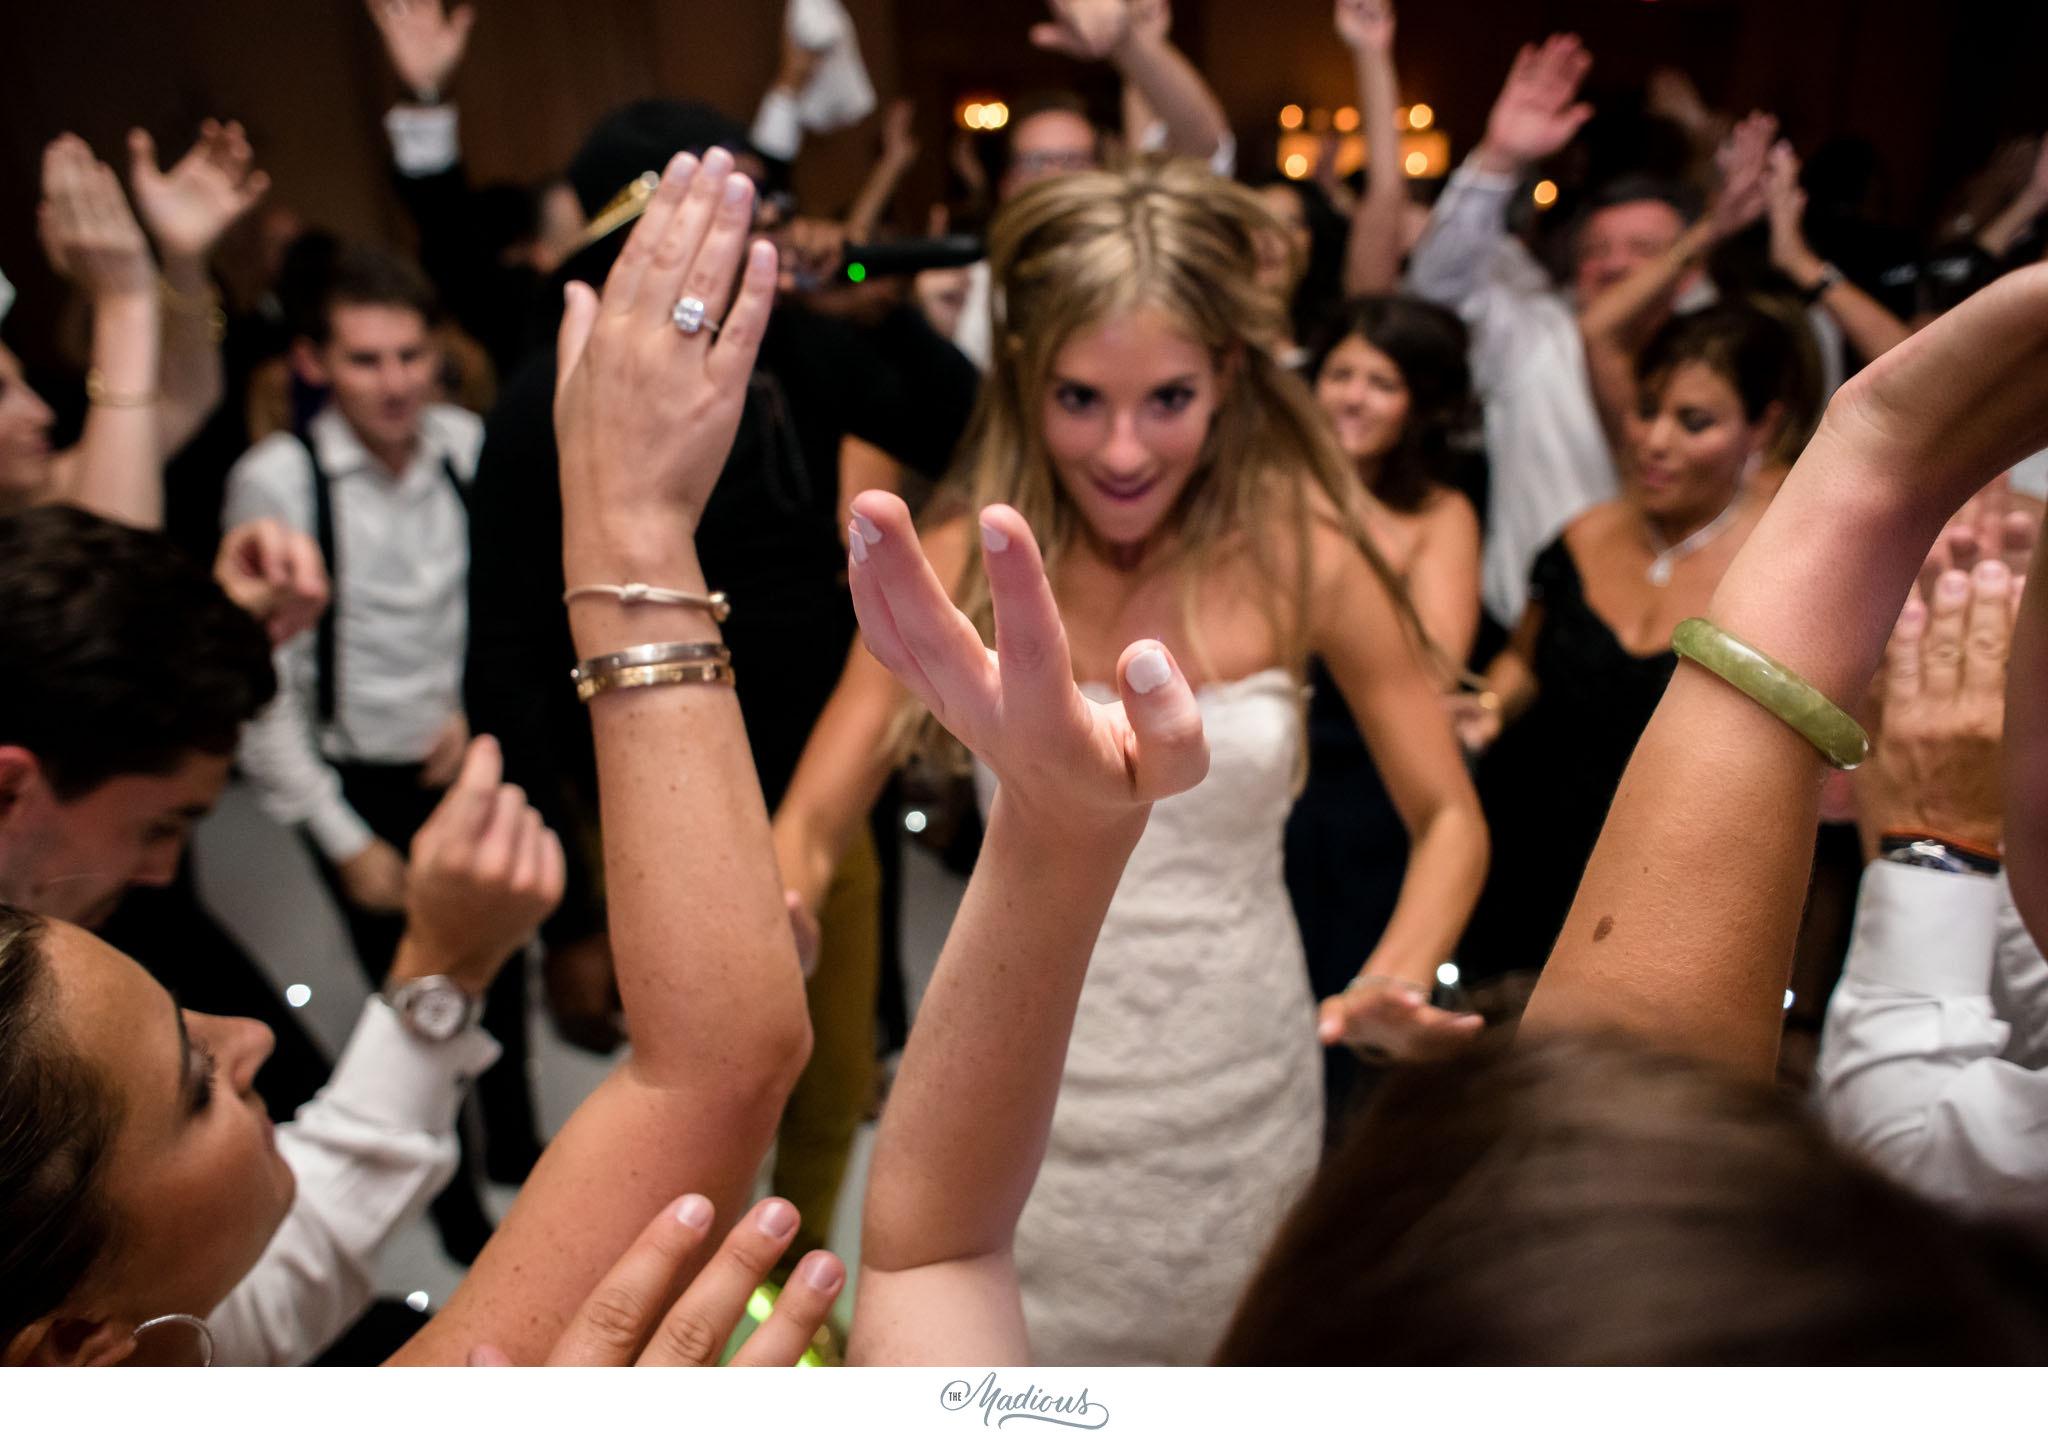 Townsend hotel michigan wedding_60.JPG